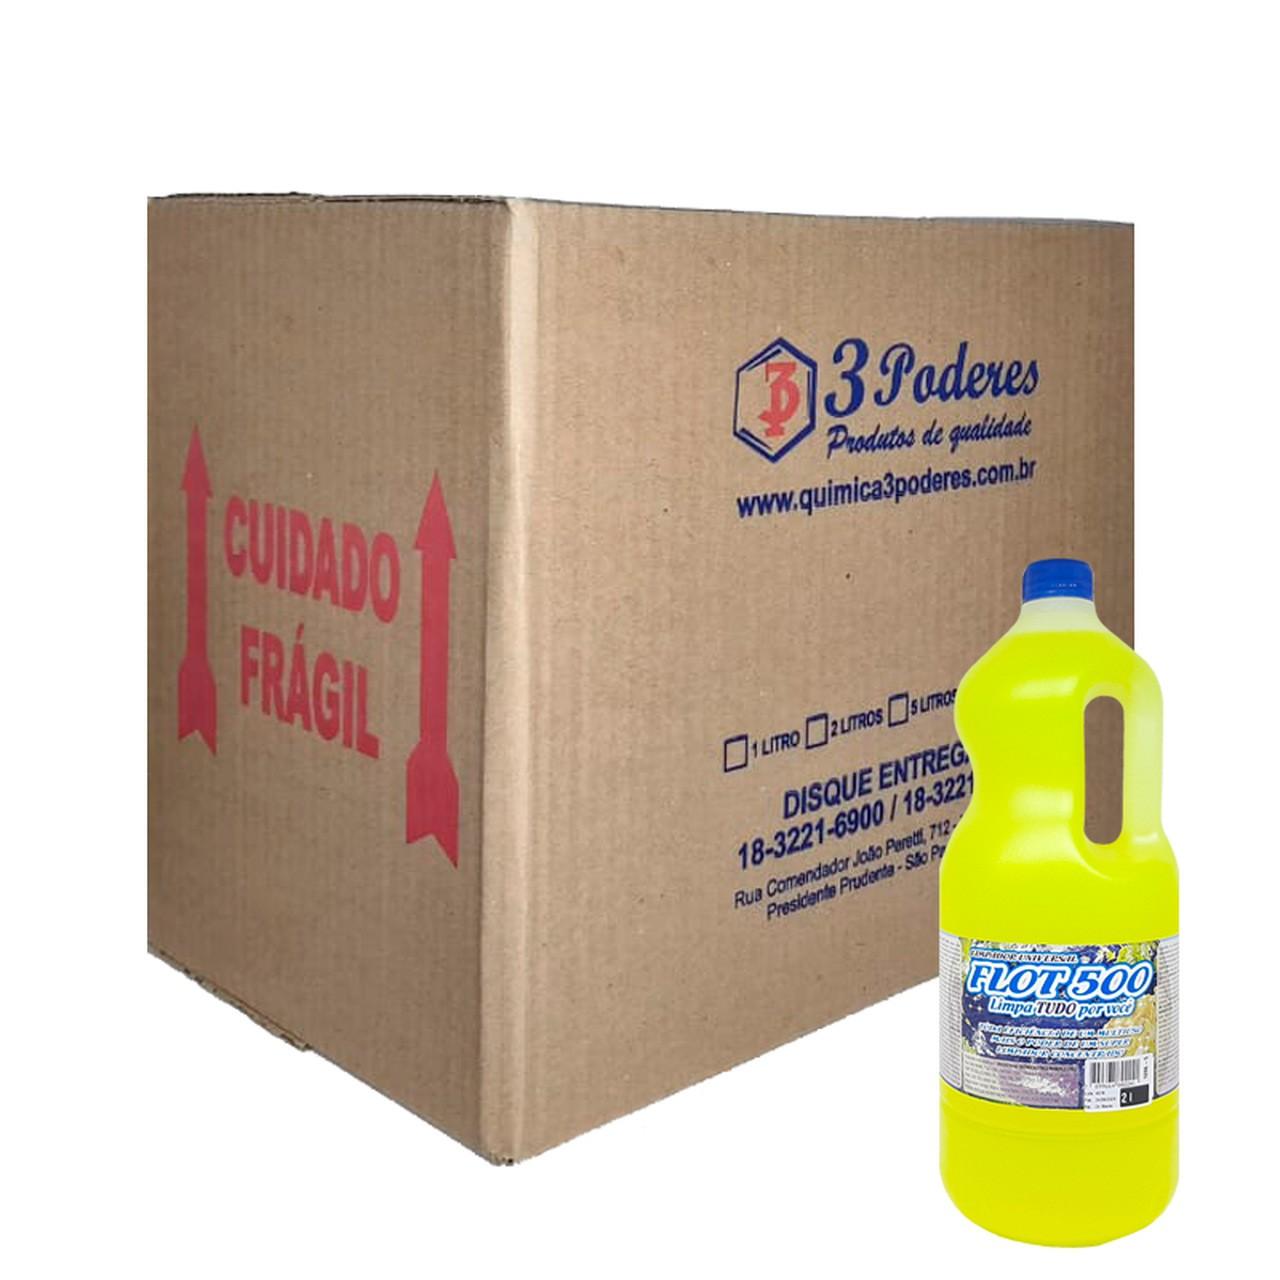 Limpador Universal Flot 500 3 Poderes 2LTS -Flotador Biodegradável - Caixa com 6 Un.